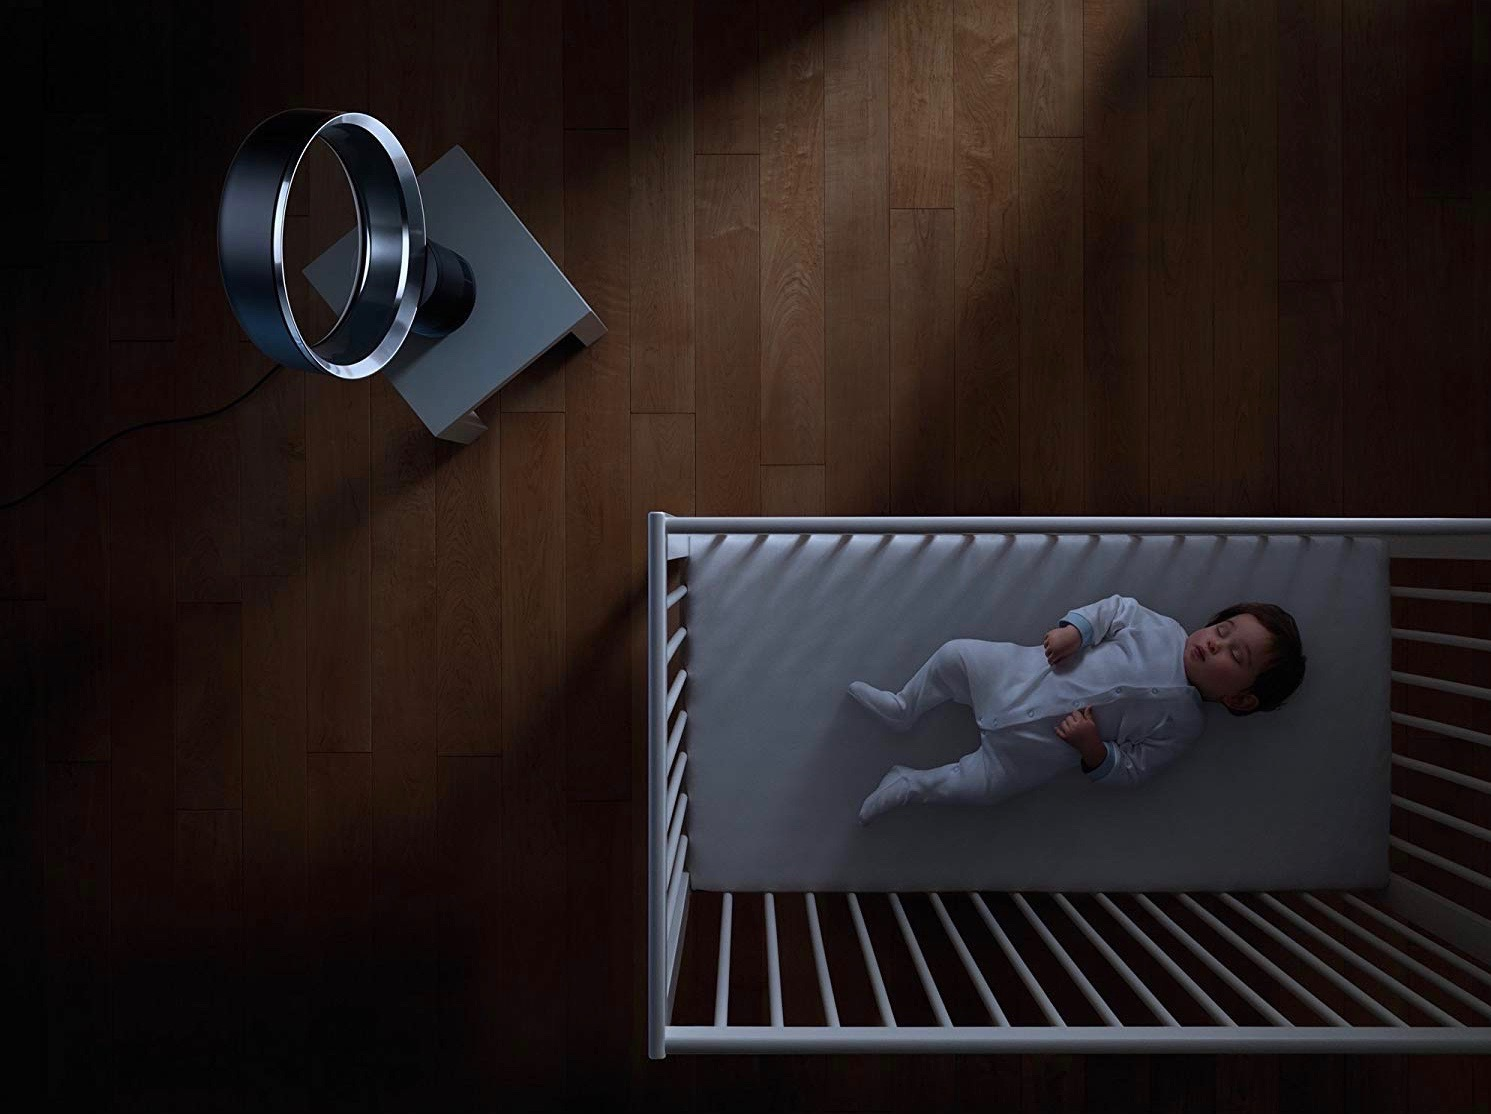 ventilador sin aspas Dyson AM06 silencioso seguro